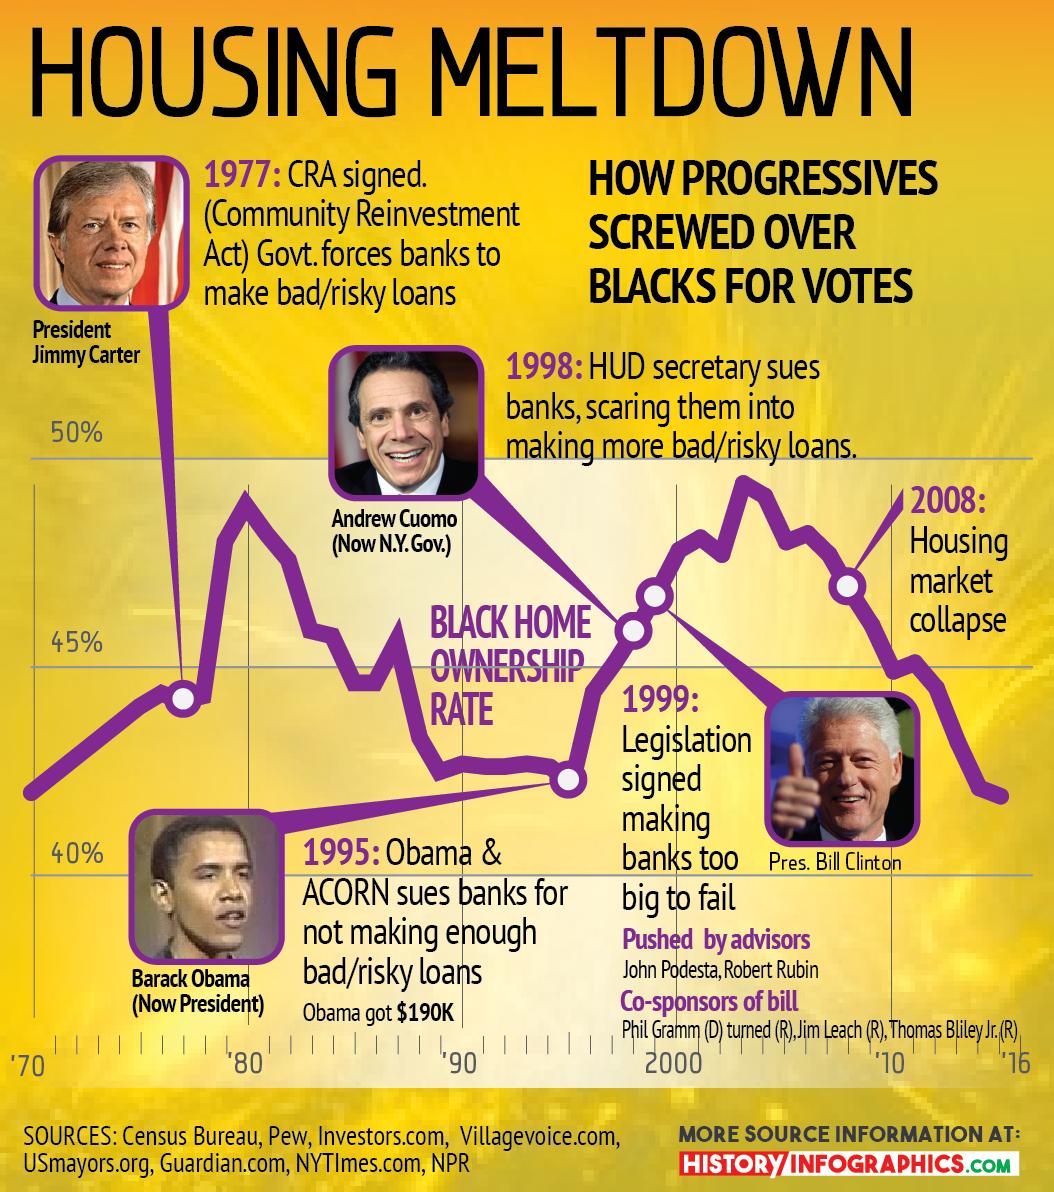 meltdown-housing-crisis-community-reinvestment-act-infographic-v5